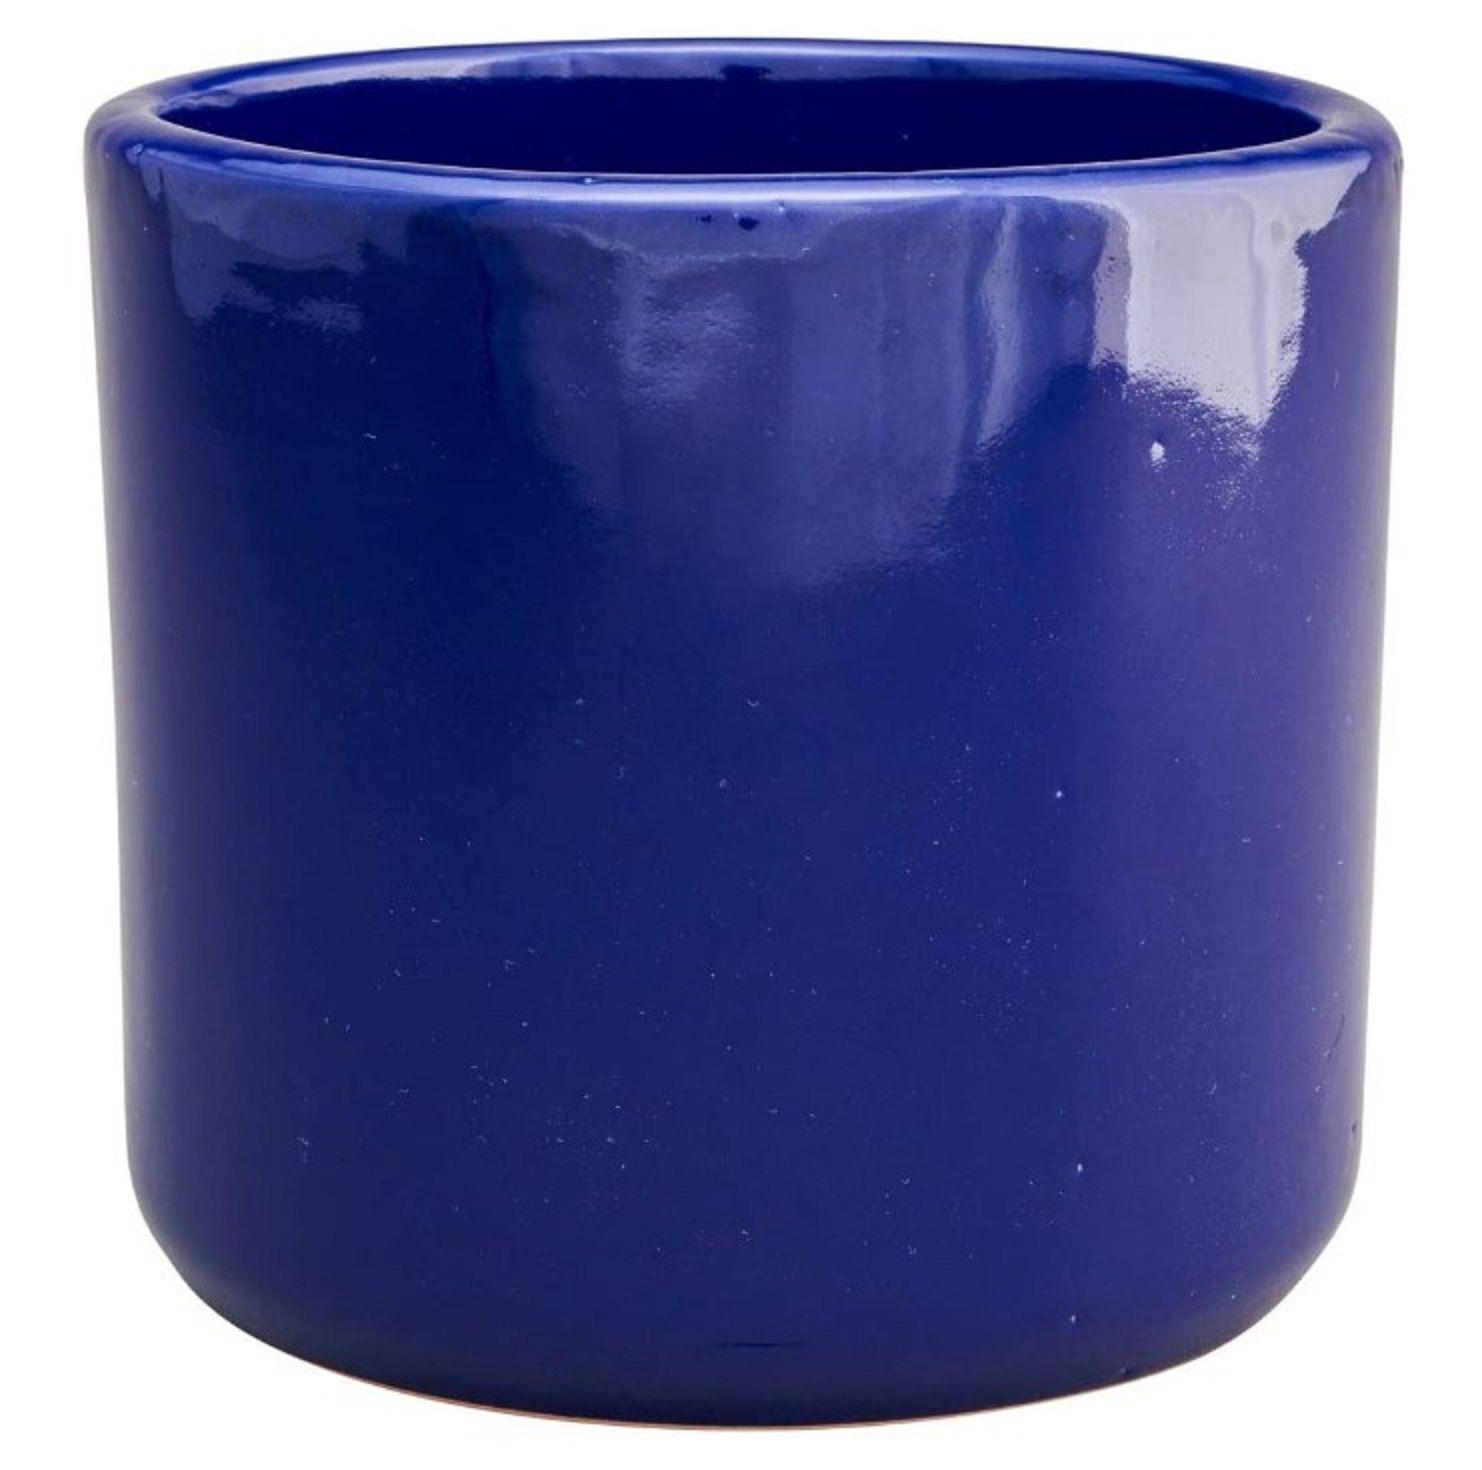 Wild Rose Goods Gloss Blue Terracotta Cylinder Planter